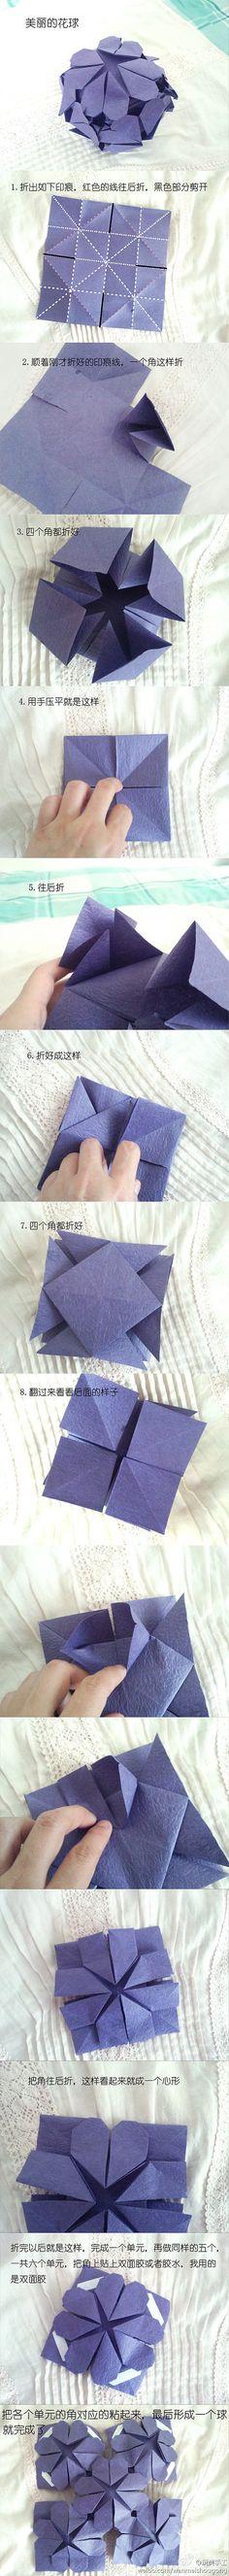 Origami flower / Оригами цветок (предположительно гербера)